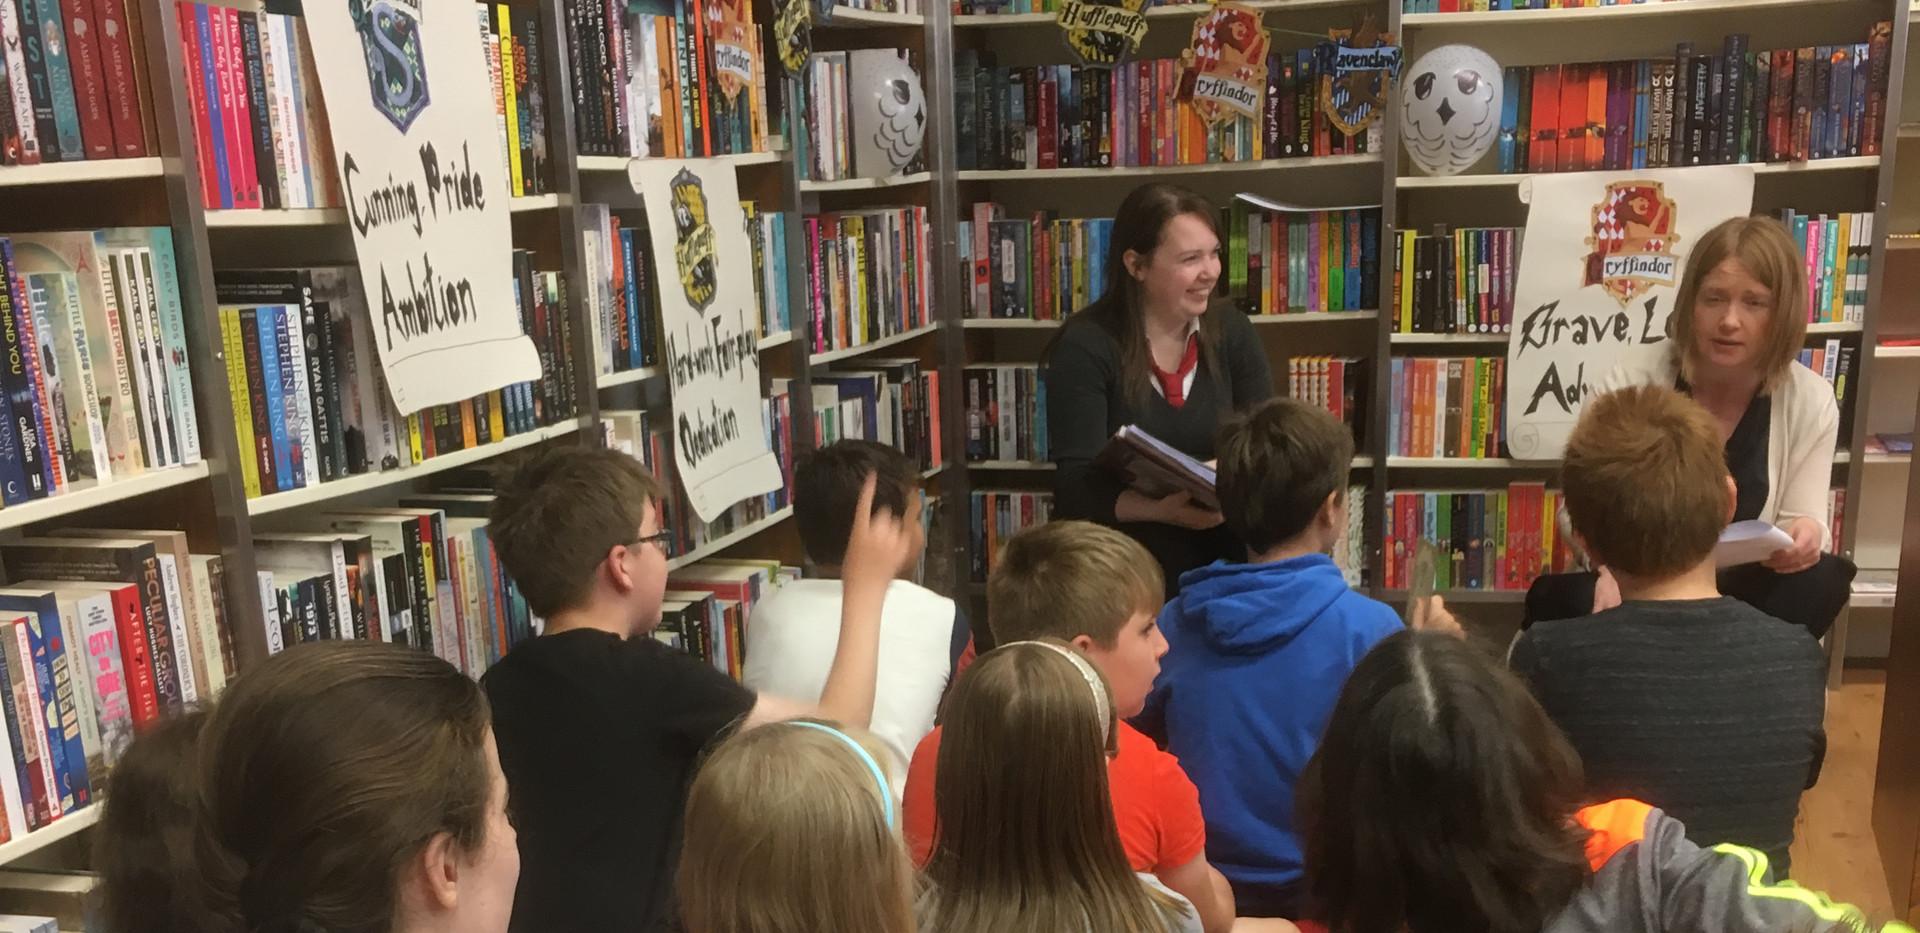 Harry Potter Workshop at The Reading Room Bookshop